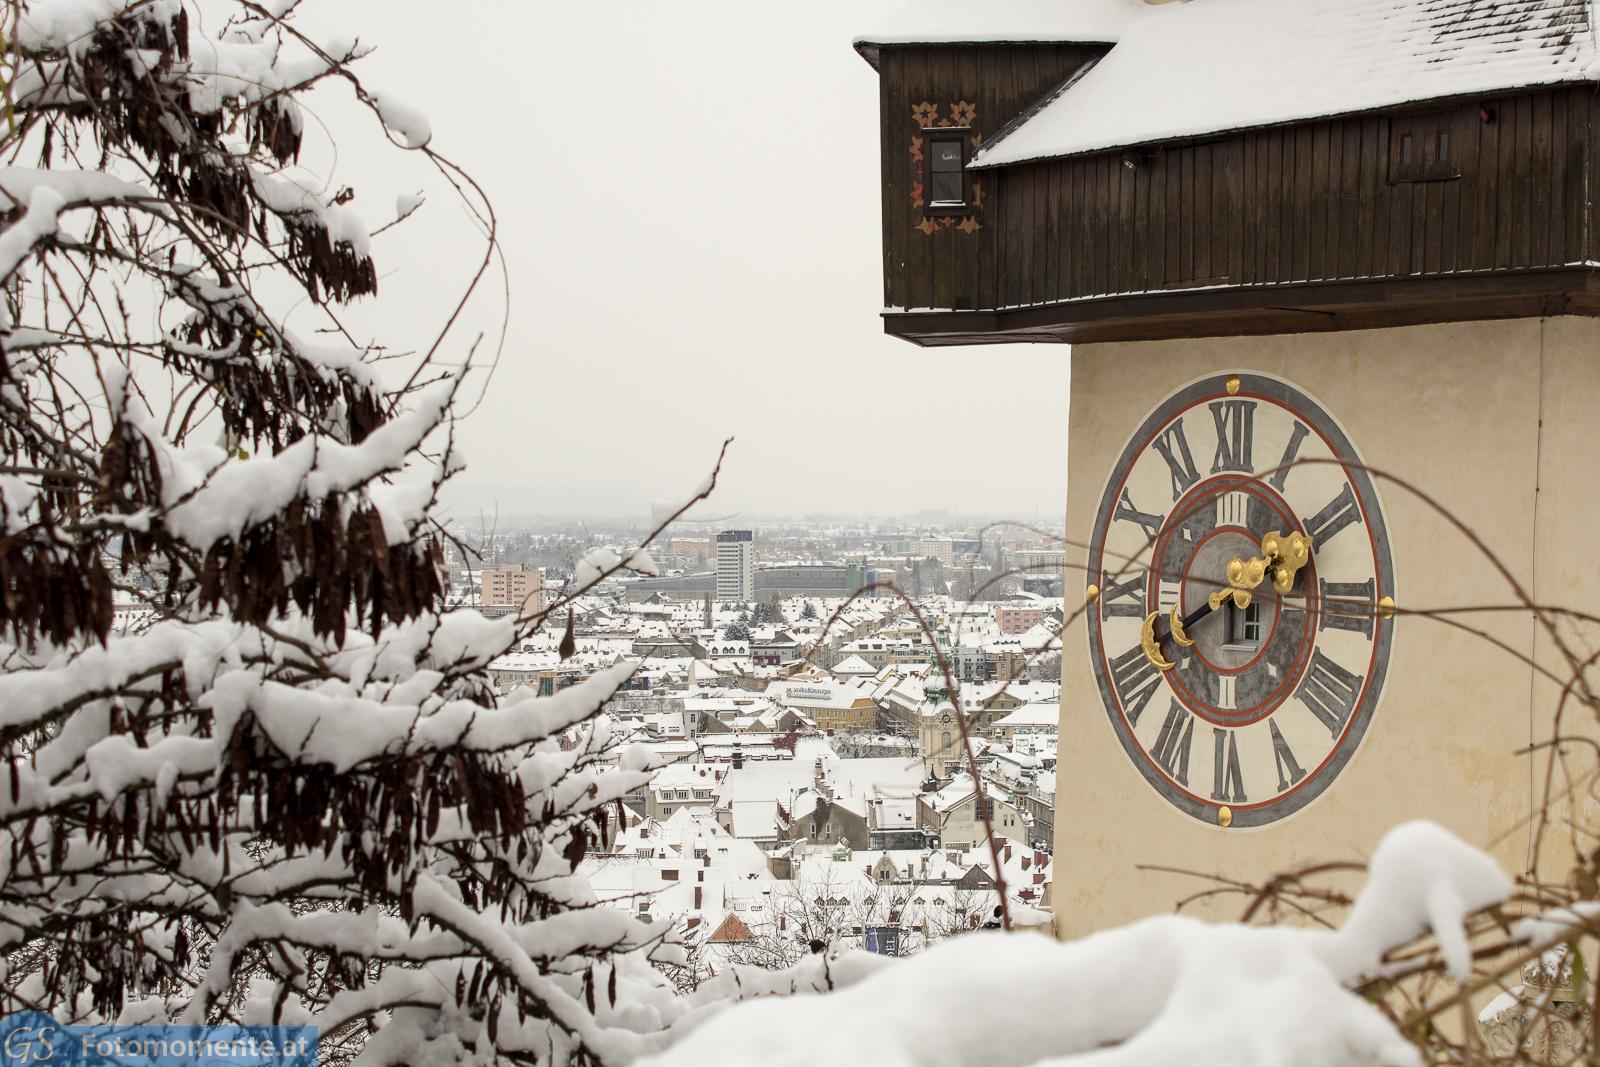 Graz im Schnee Uhrturm im Ausschnitt - Graz im Schnee, Dezember 2014